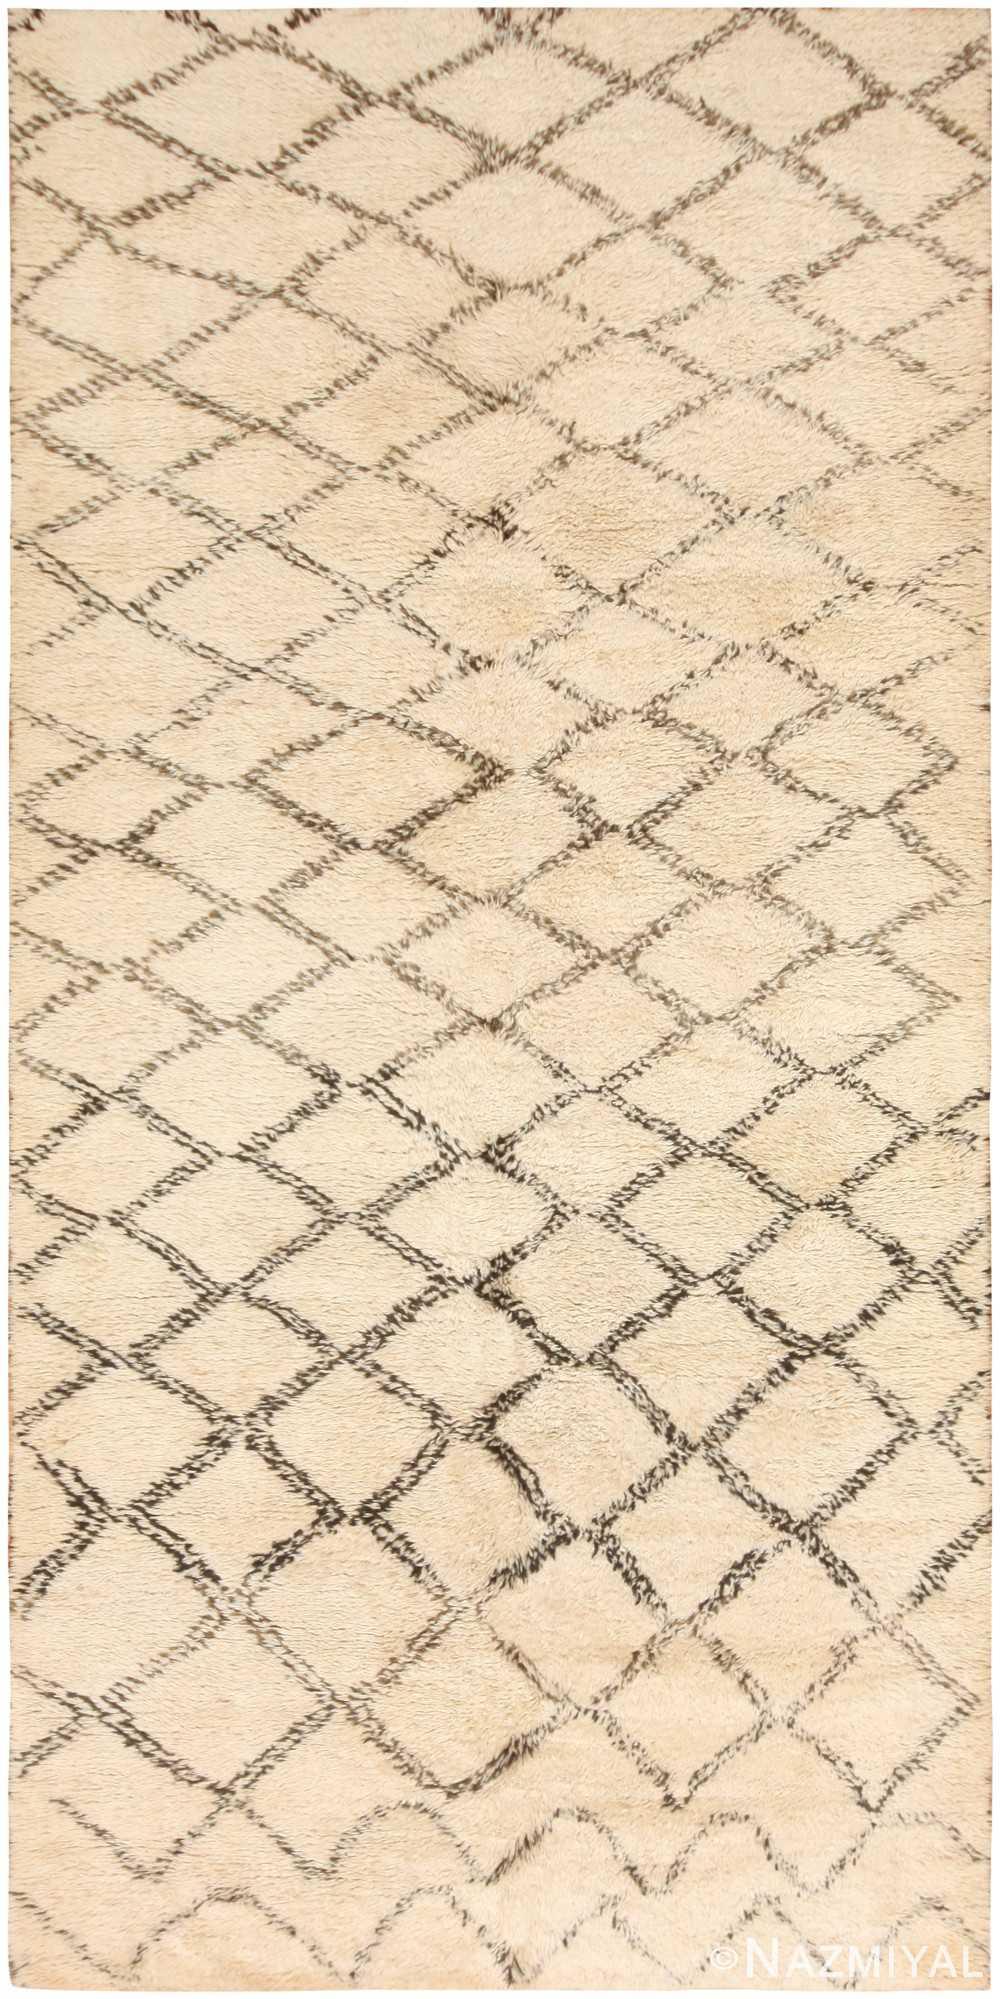 Vintage Moroccan Rug 47091 Detail/Large View